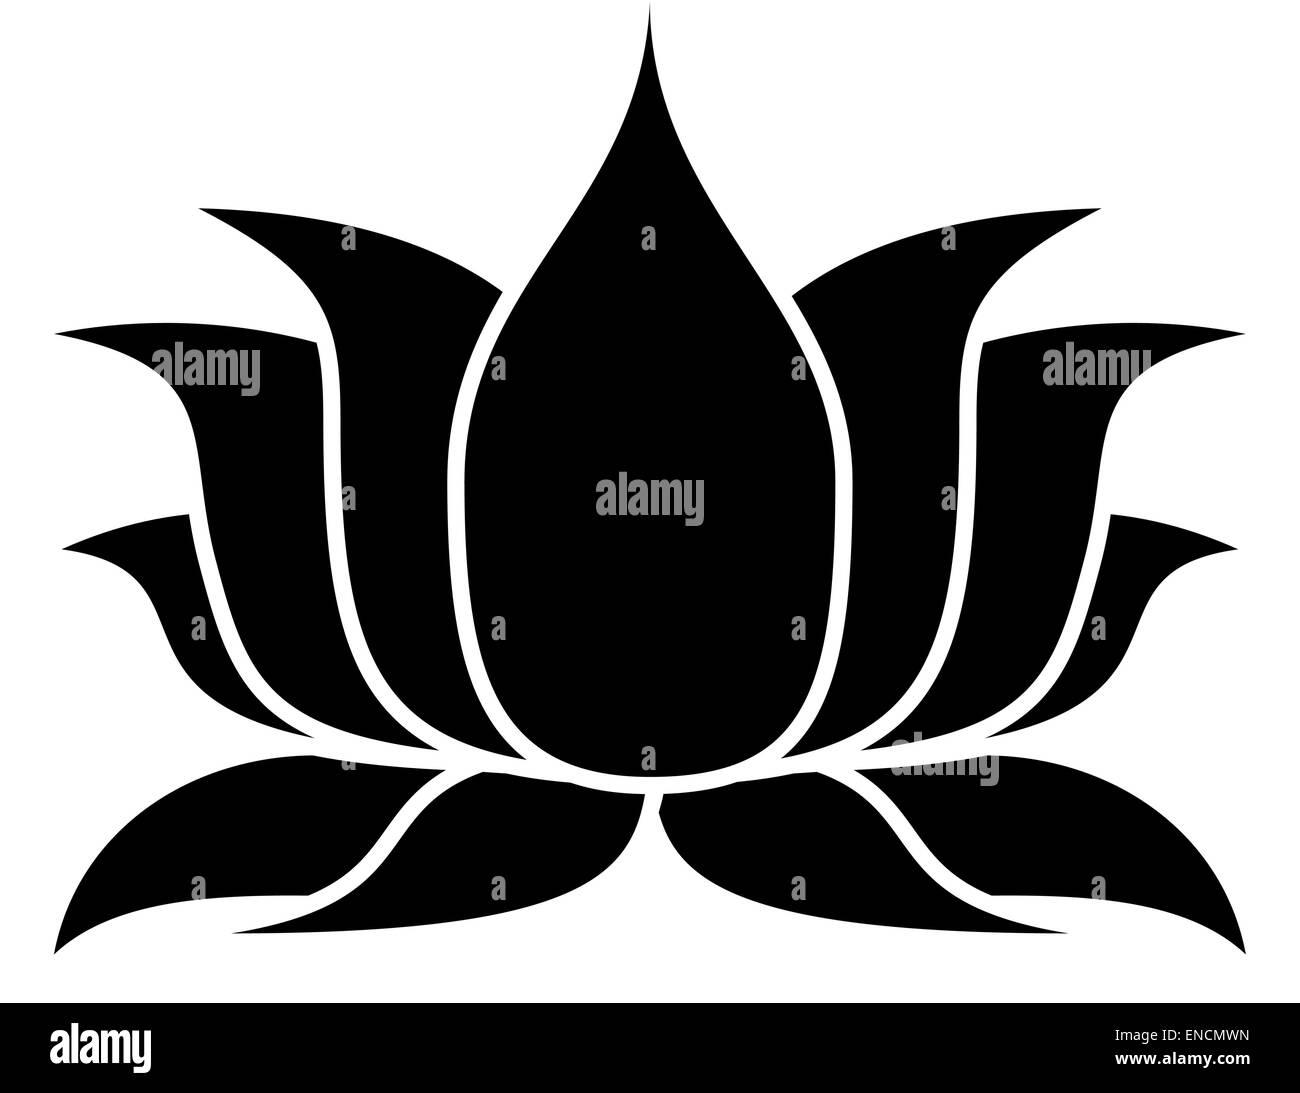 Image Gallery lotus flower silhouette